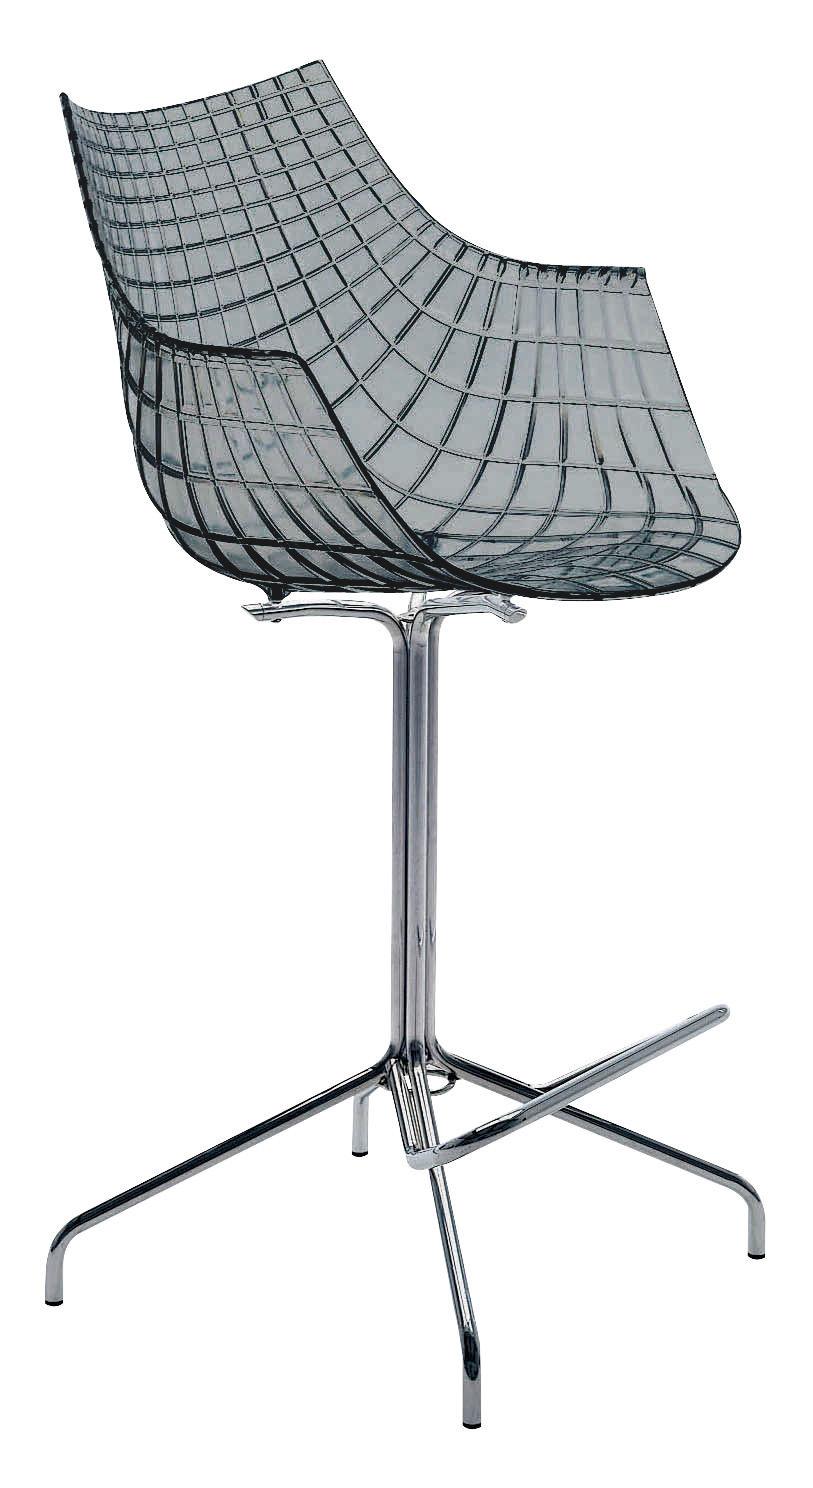 chaise de bar meridiana h 65 cm polycarbonate fum gris driade. Black Bedroom Furniture Sets. Home Design Ideas